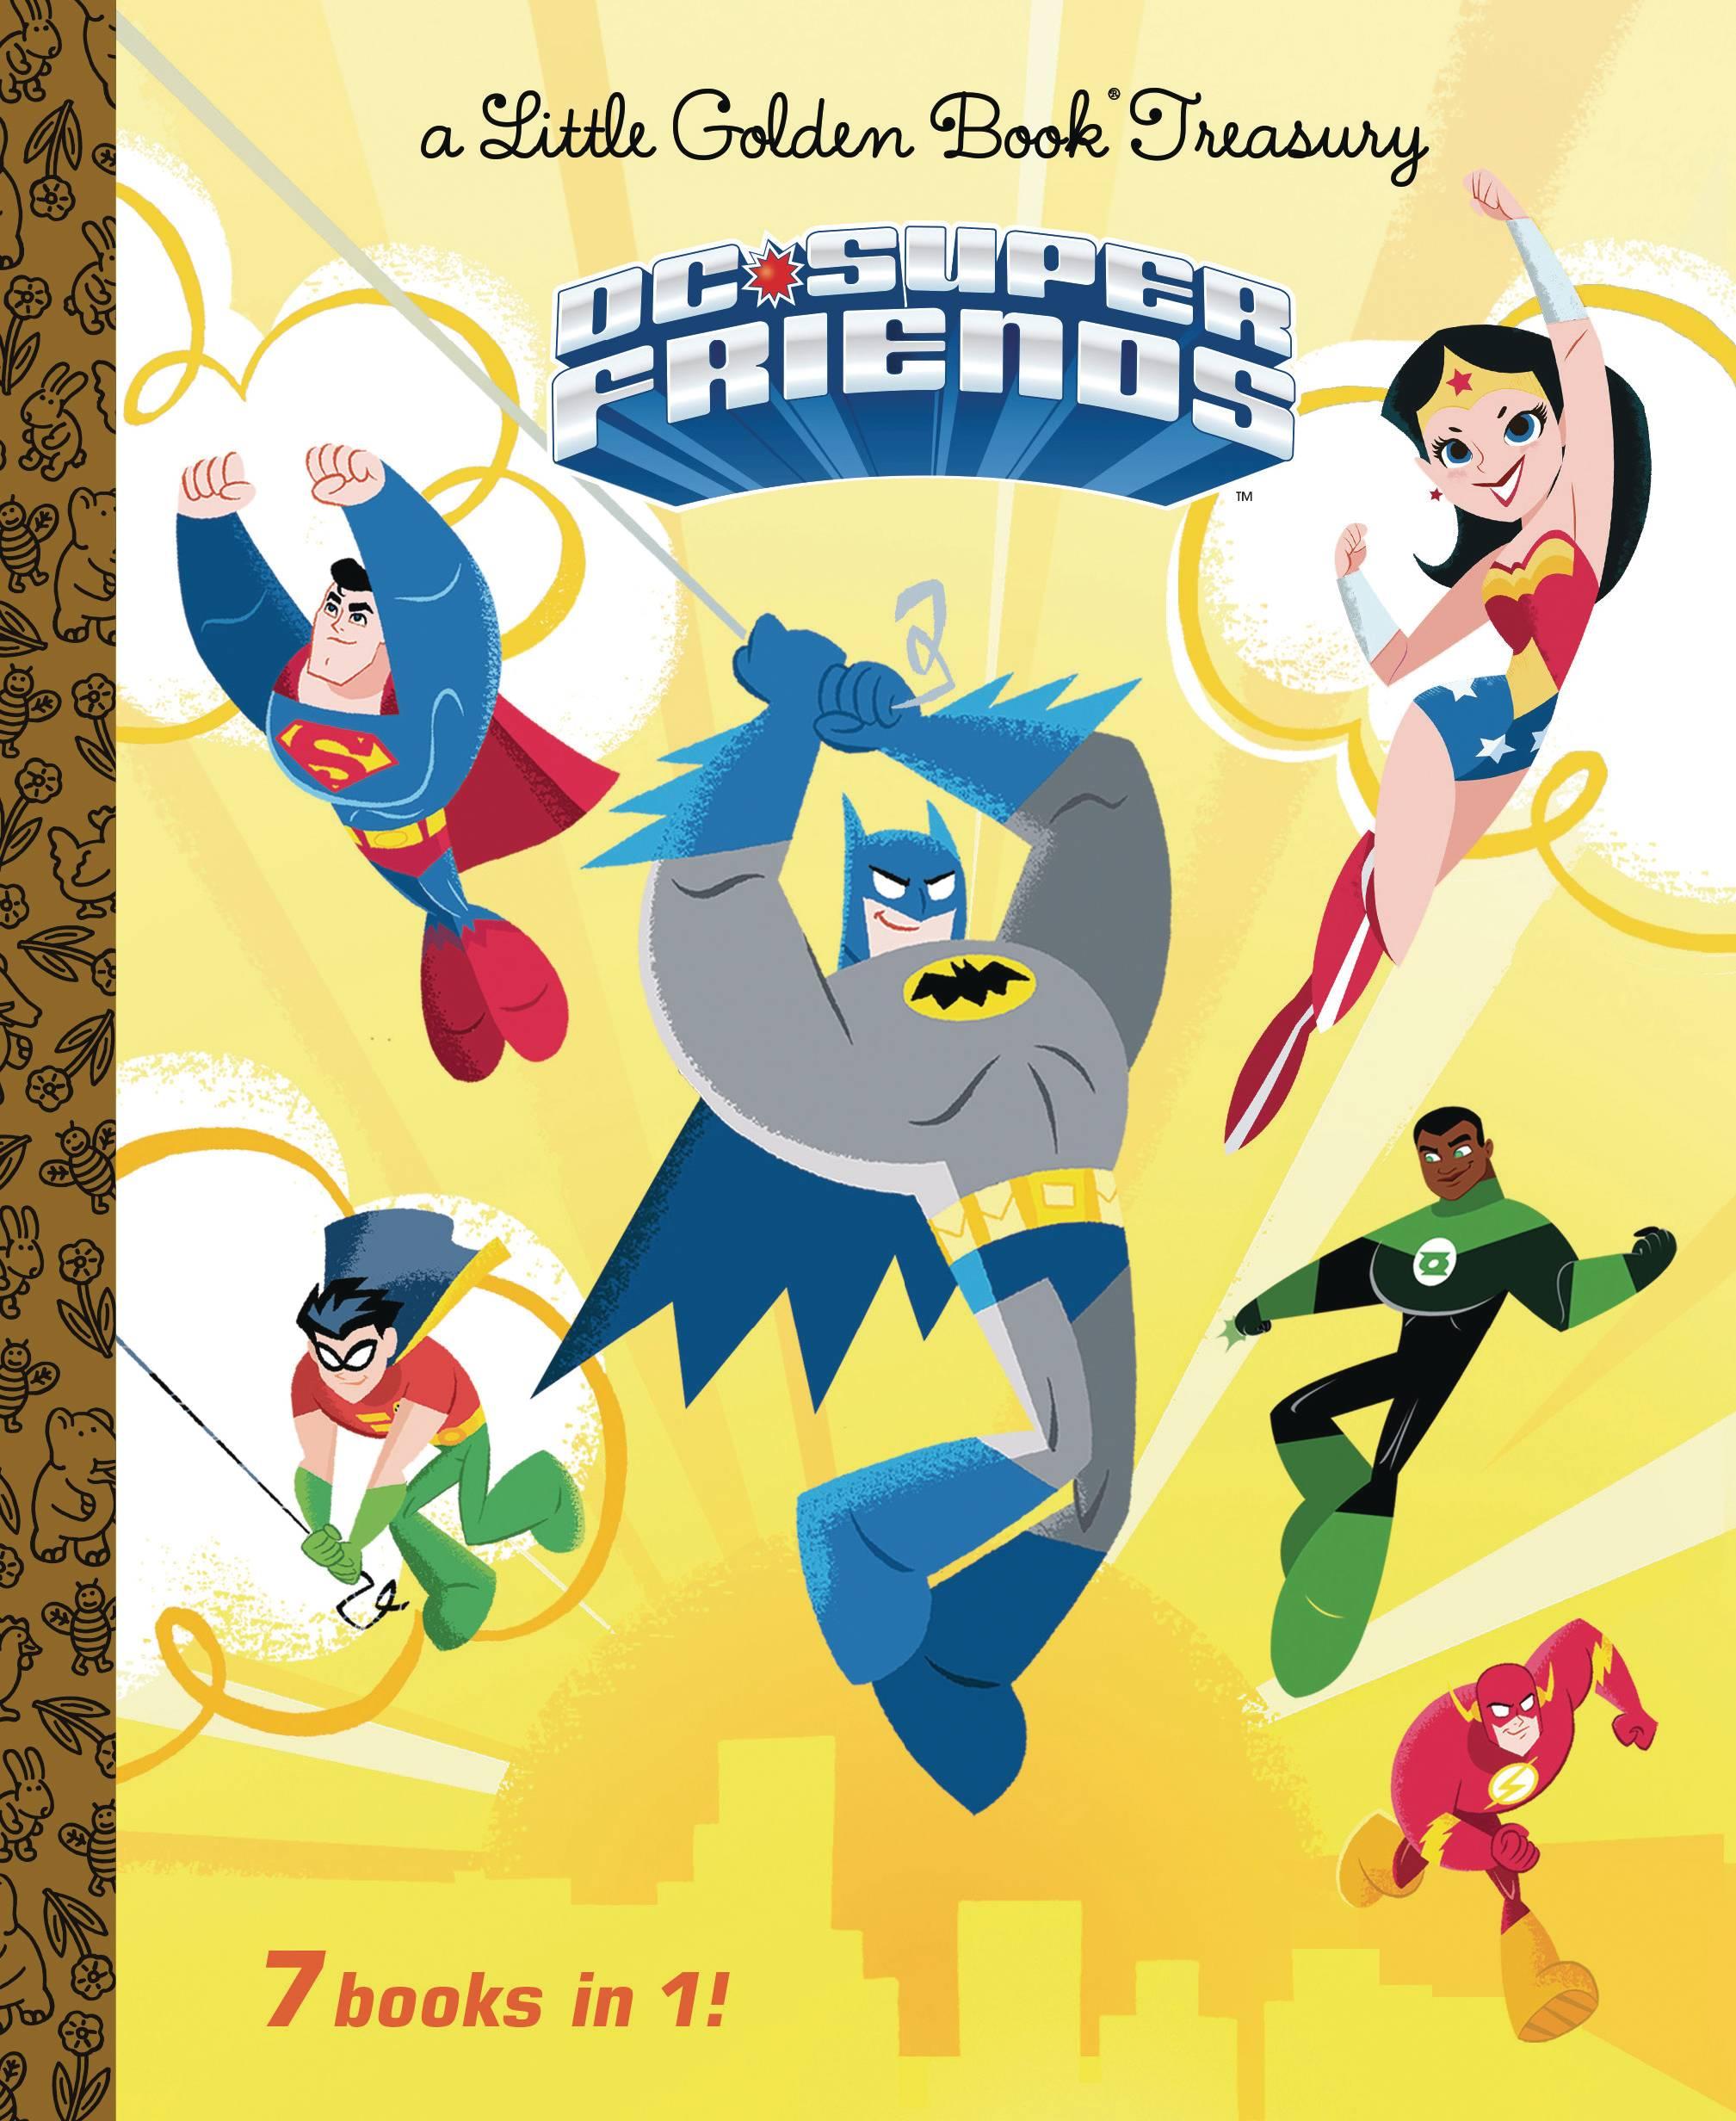 DC SUPER FRIENDS LITTLE GOLDEN BOOK TREASURY